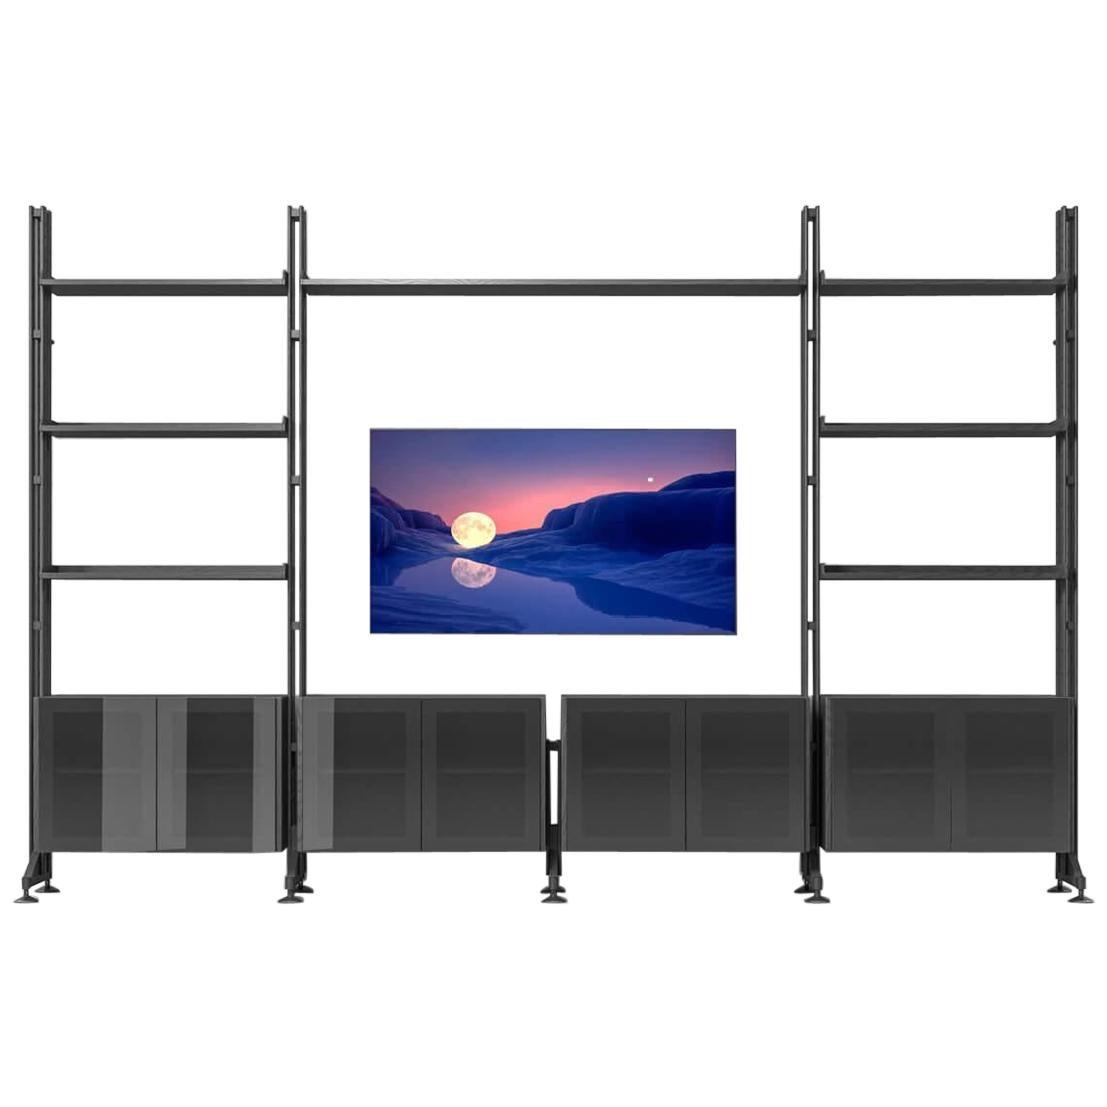 Franco Albini Infinito Wall Modular System Bookcase by Cassina